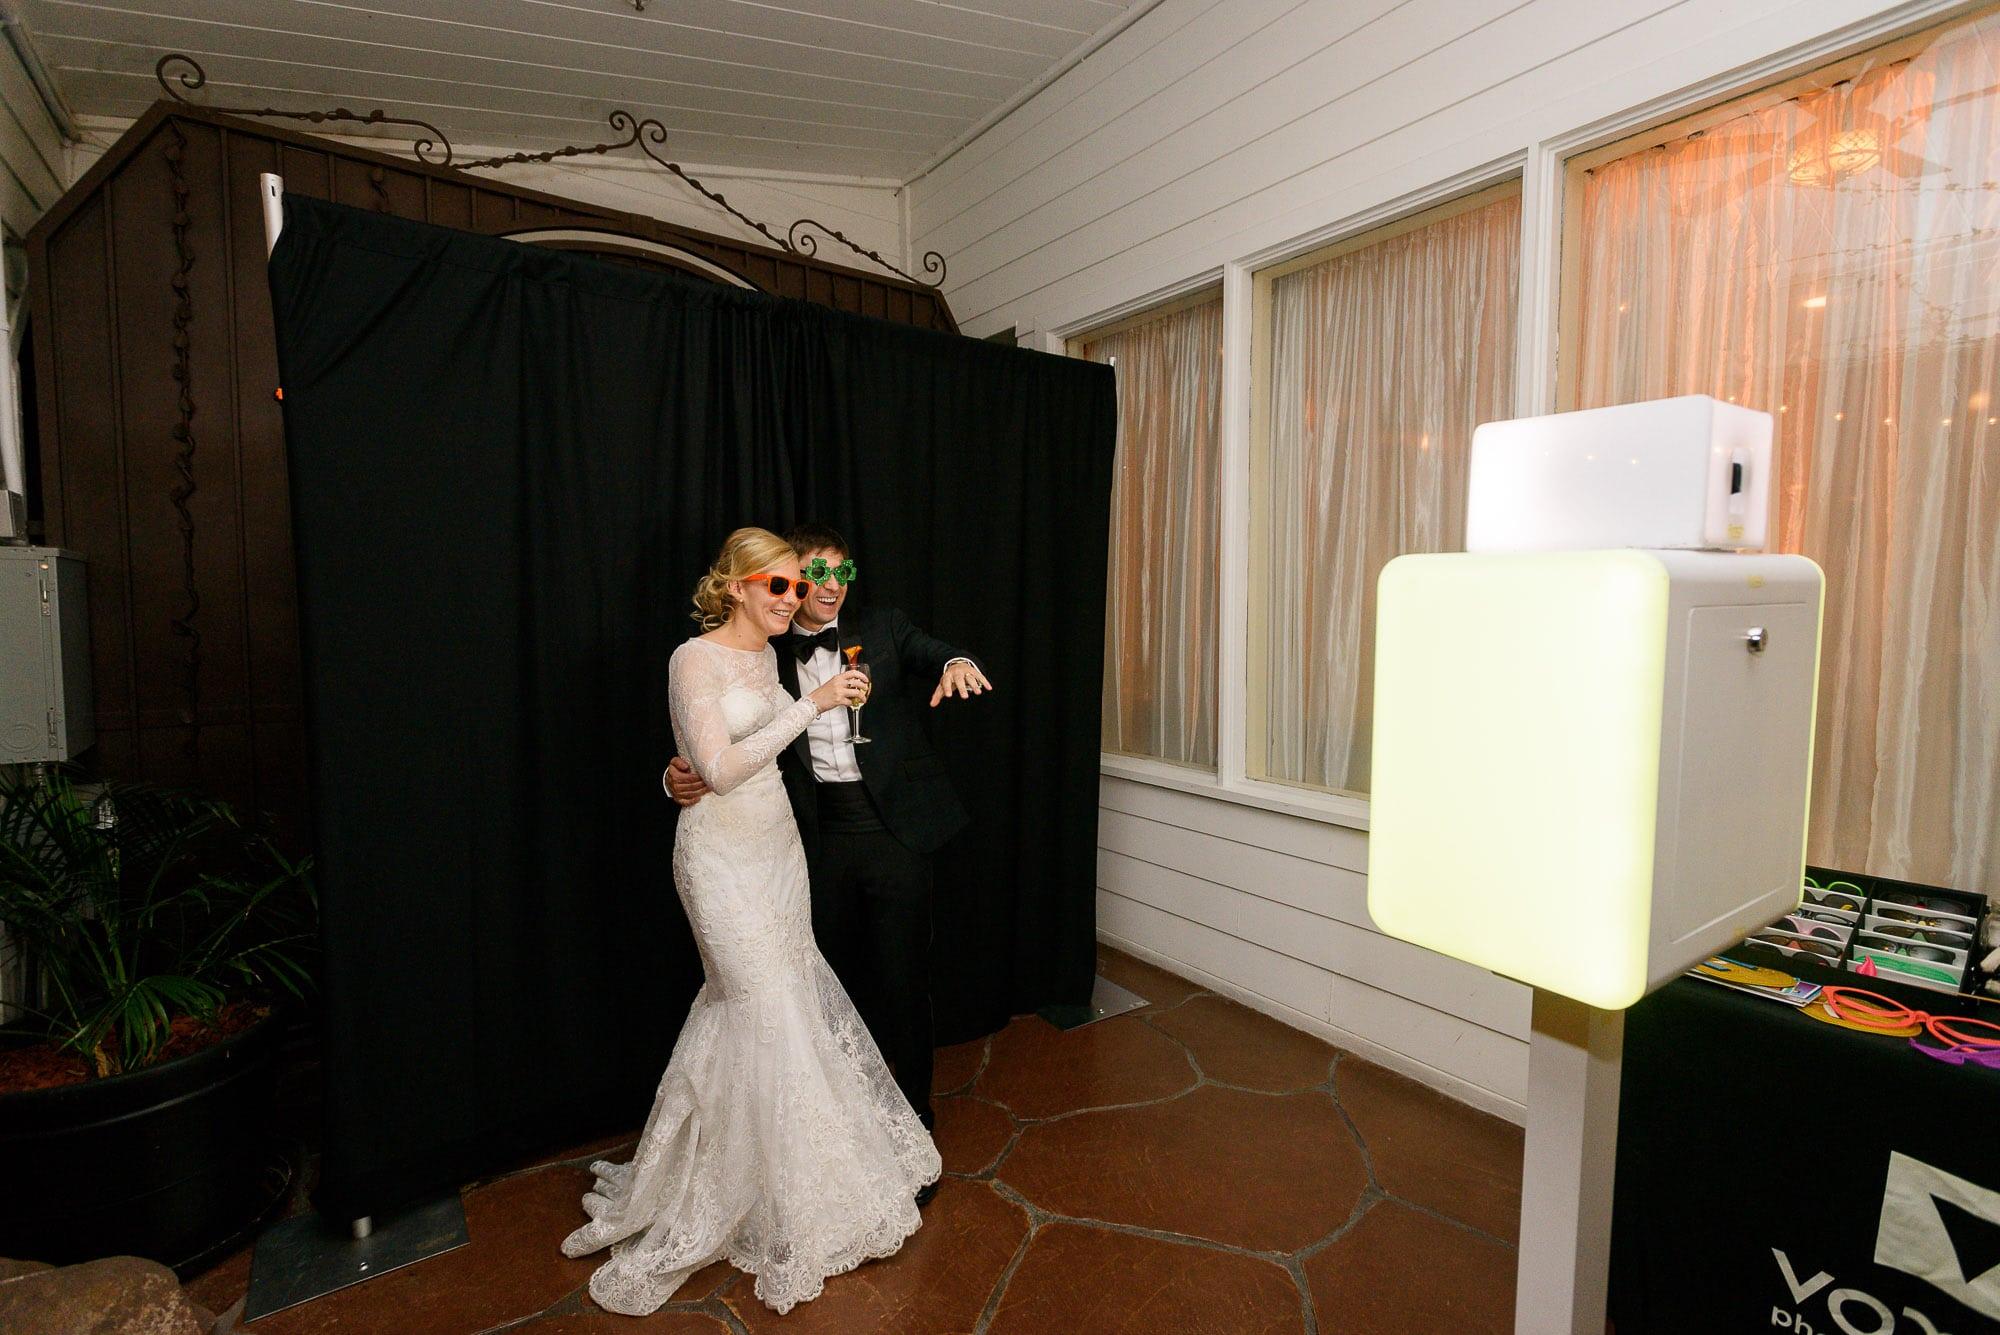 070_Alan_and_Heidi_Los_Angeles_Equestrian_Center_Wedding